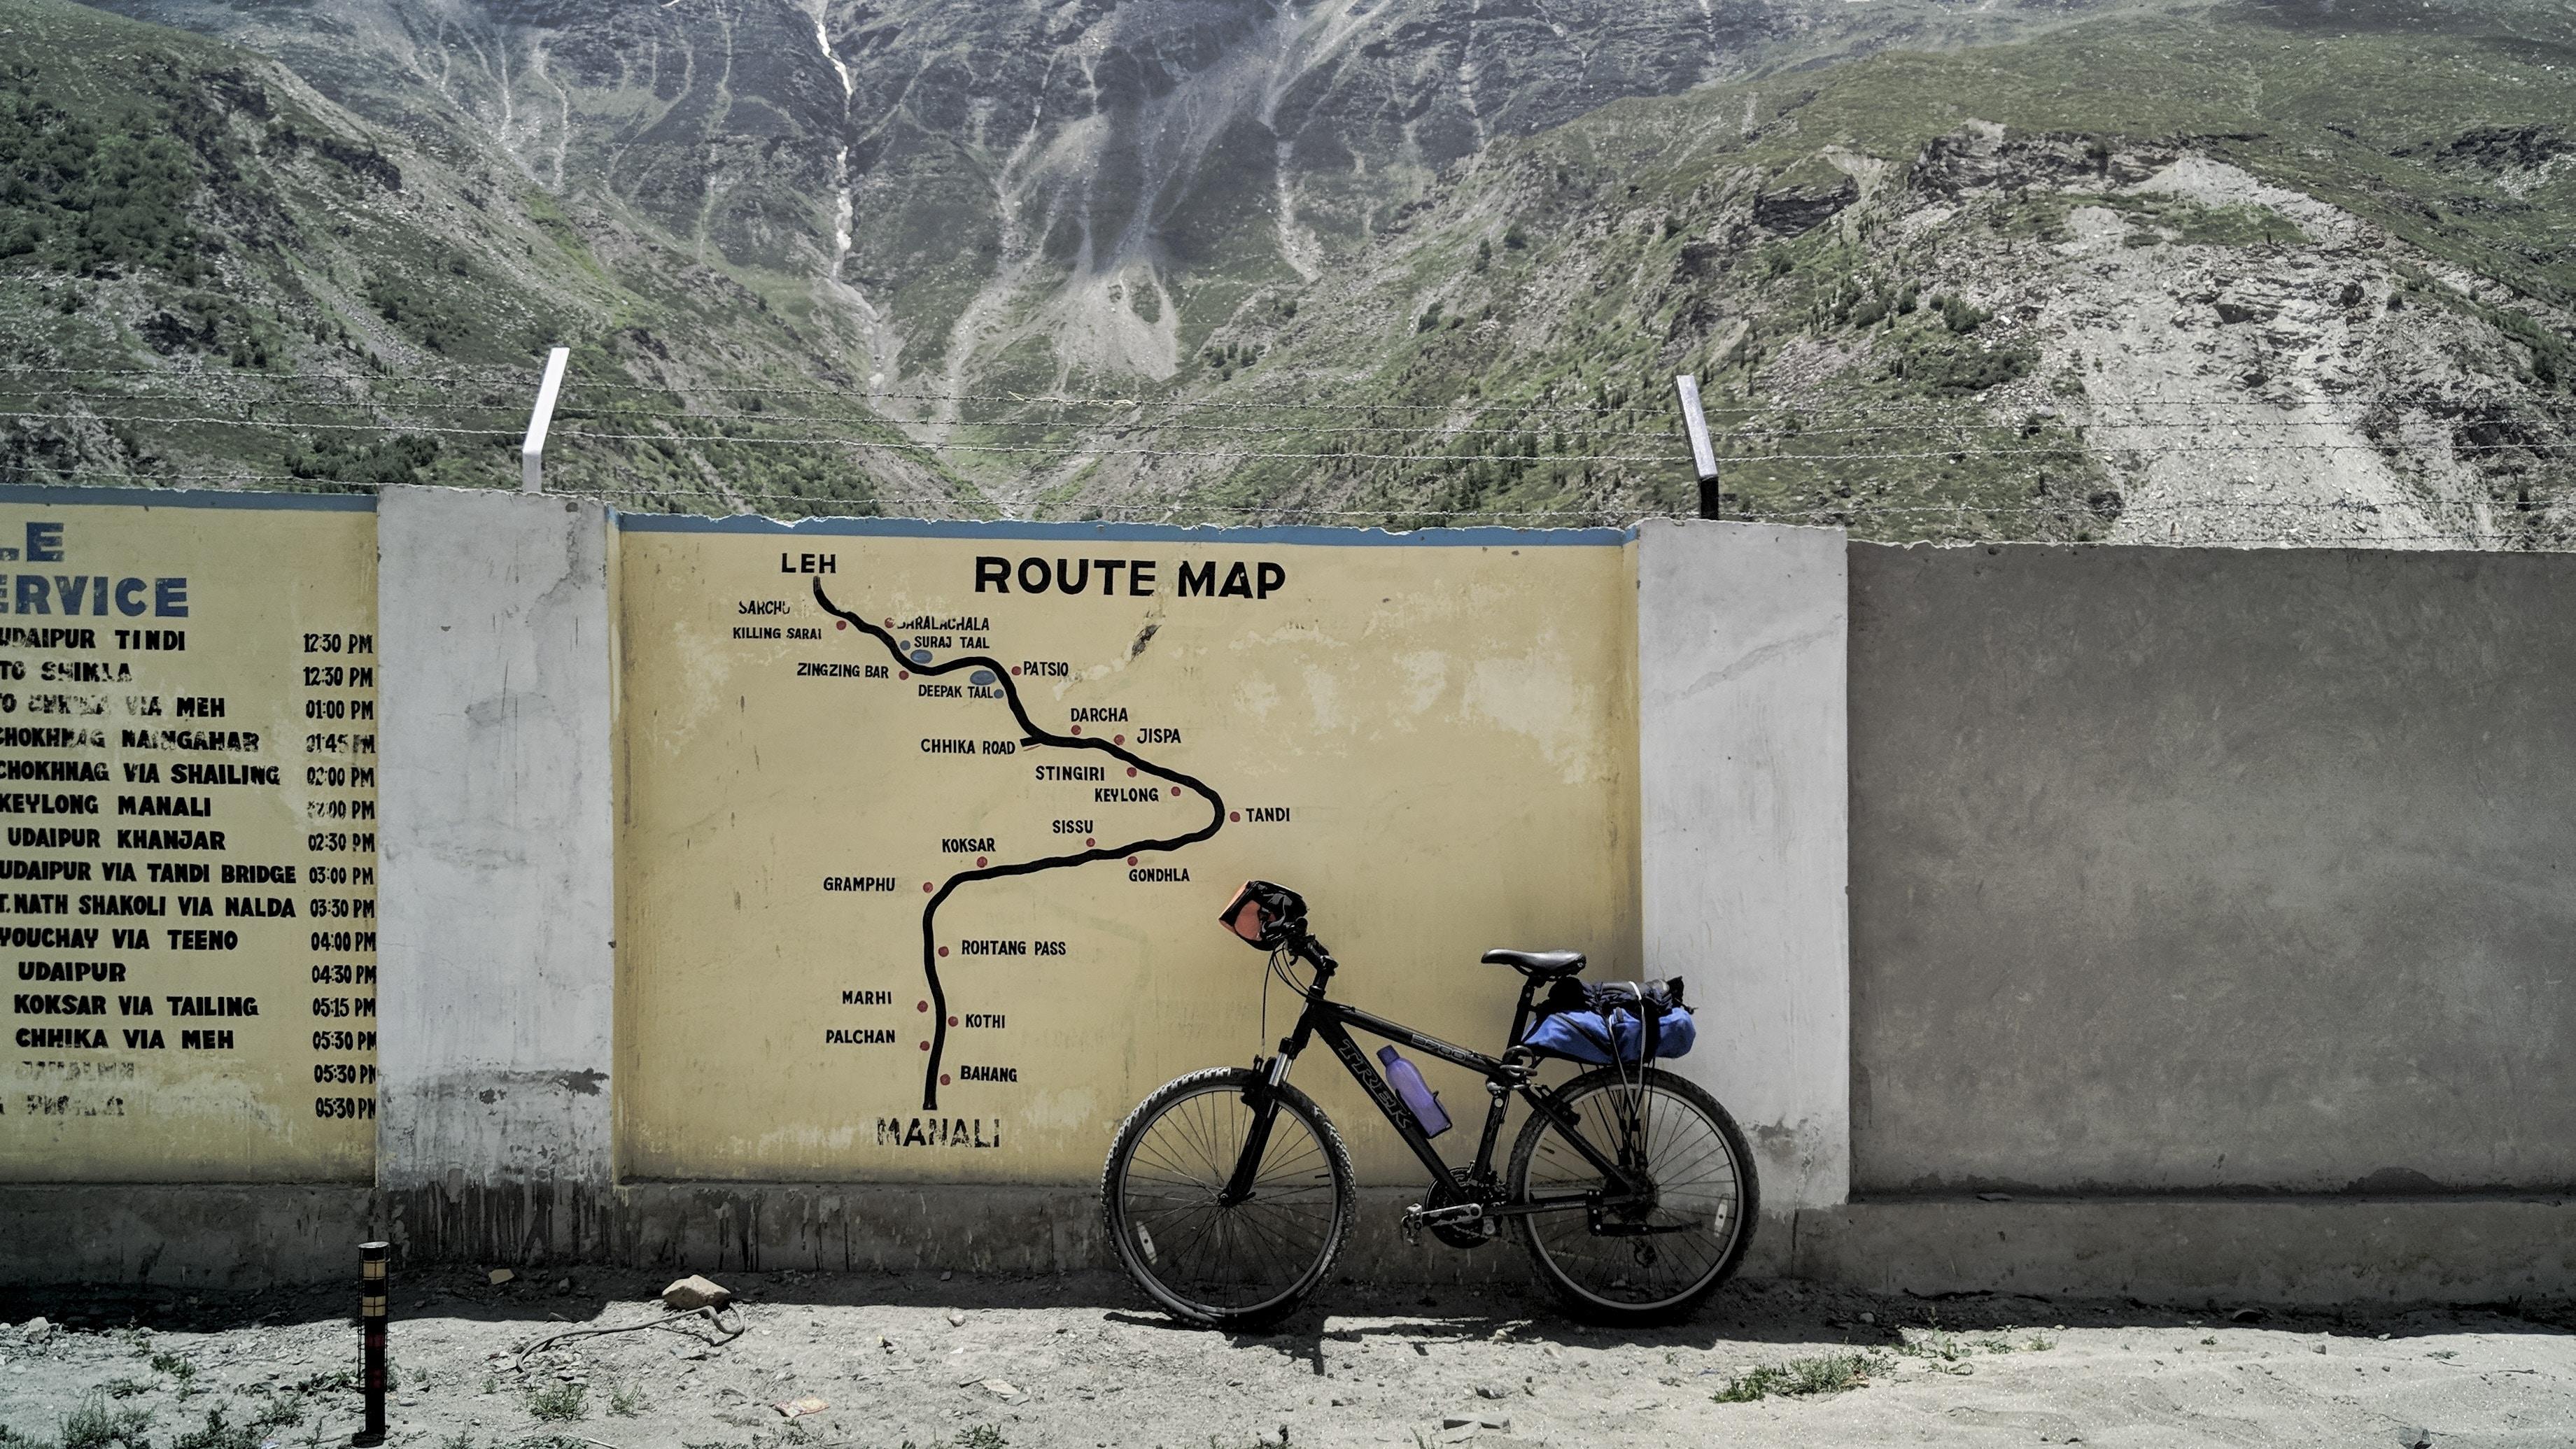 black mountain bike parked beside concrete wall